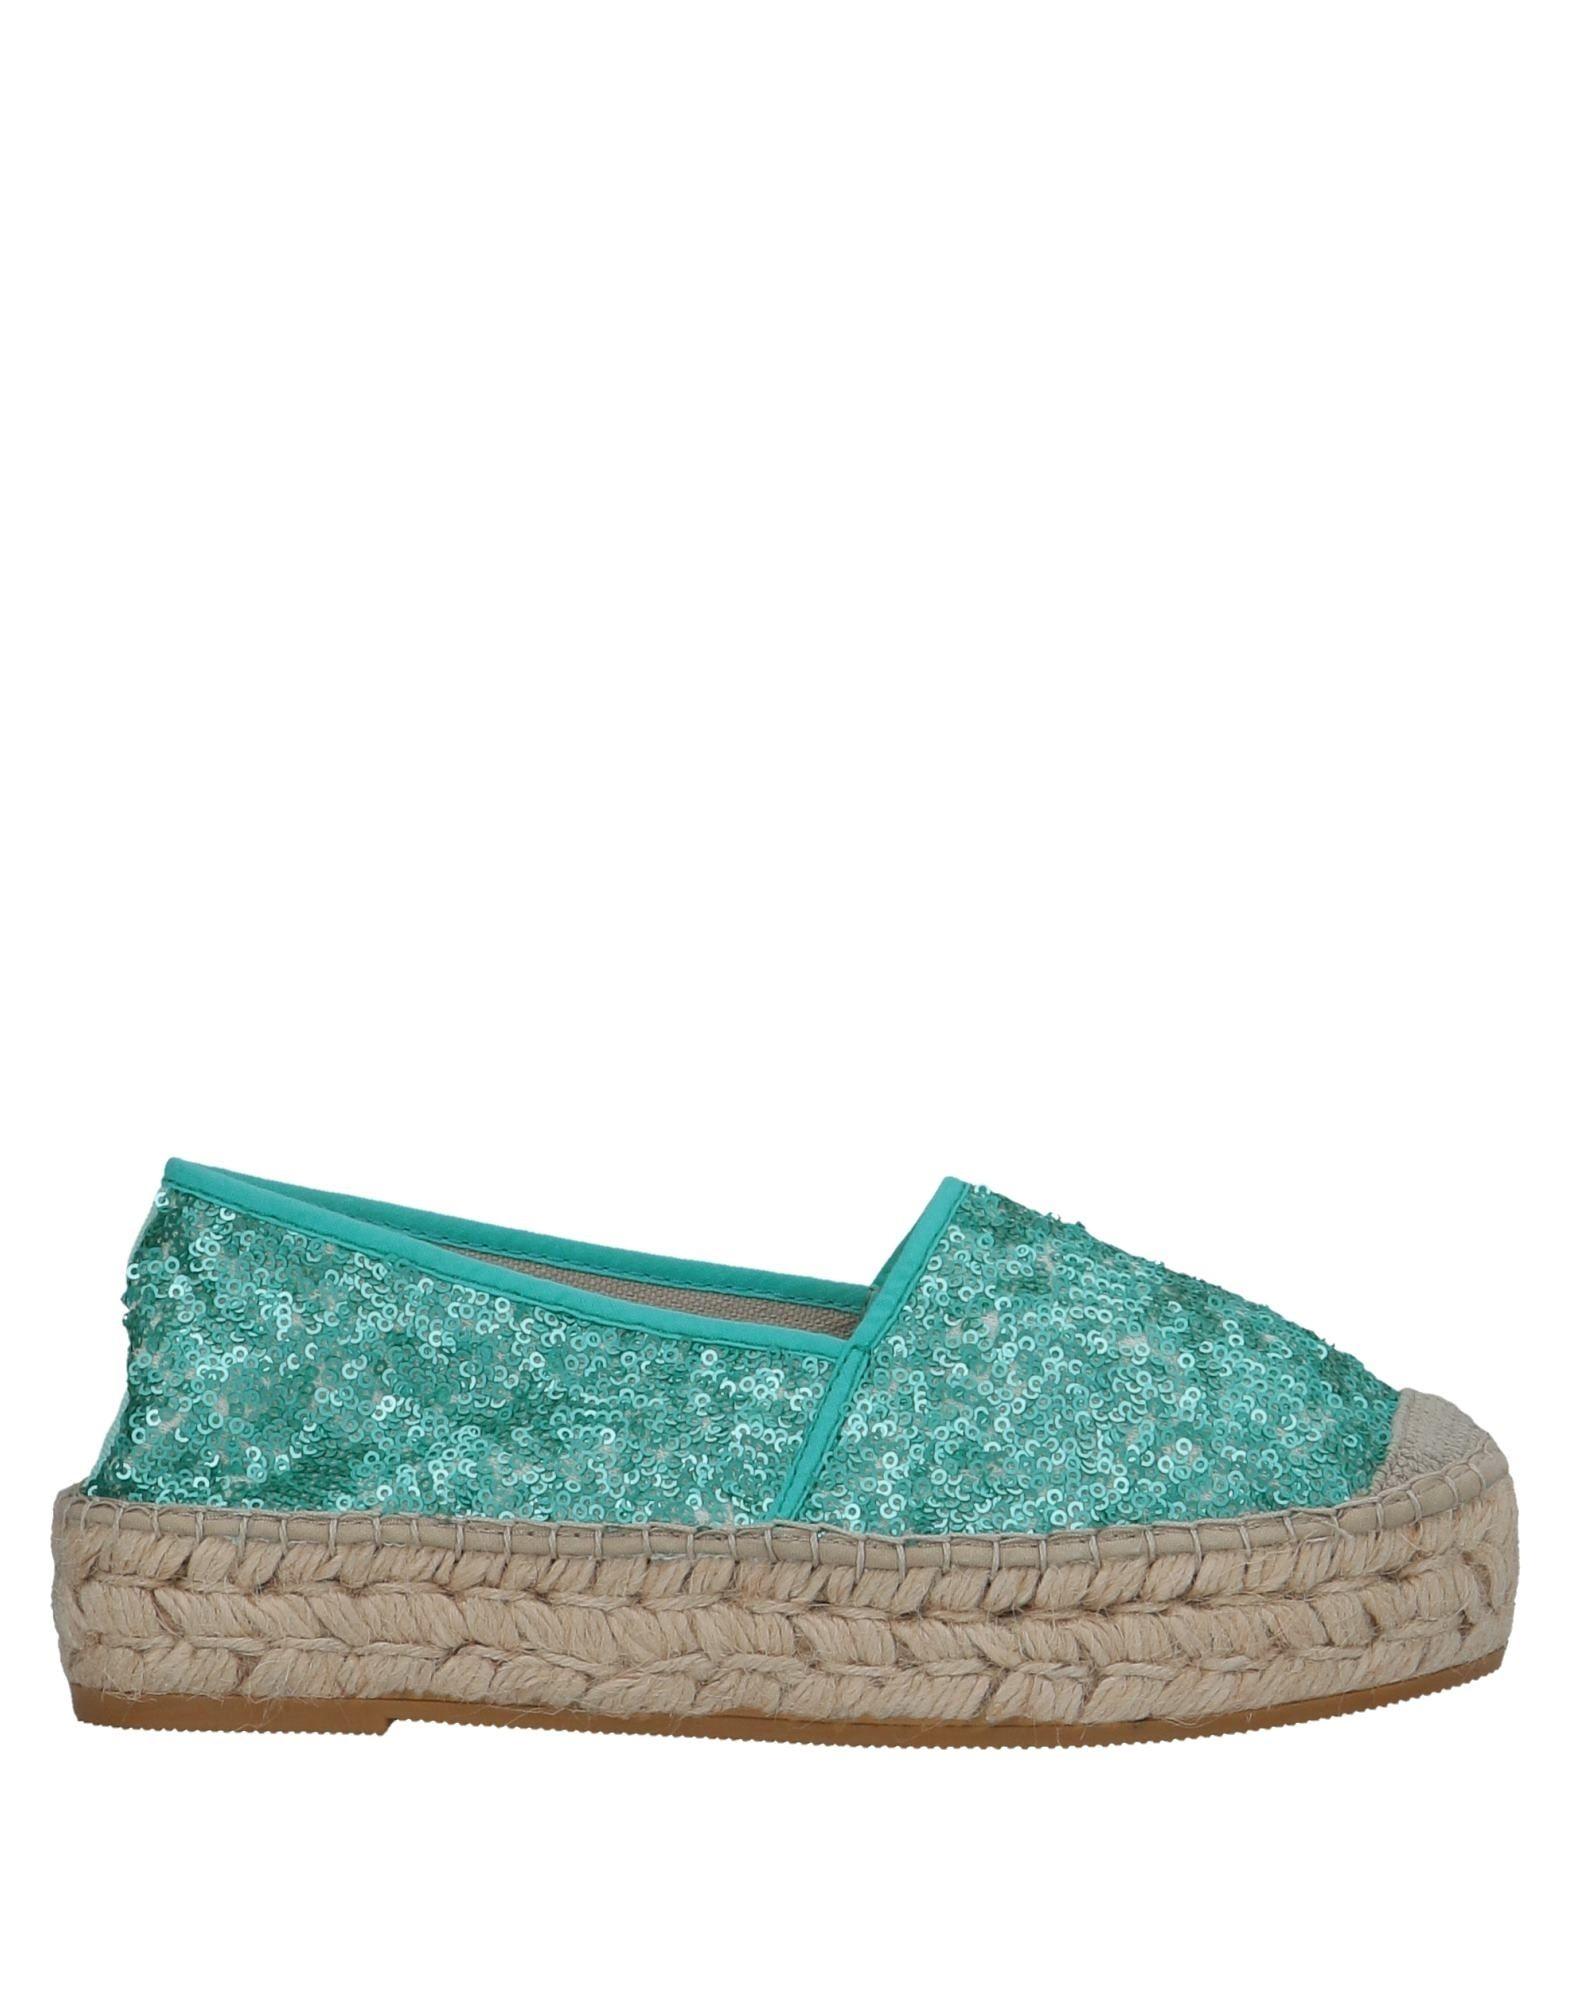 Geneve Espadrilles Damen  11175138WD Gute Qualität beliebte Schuhe